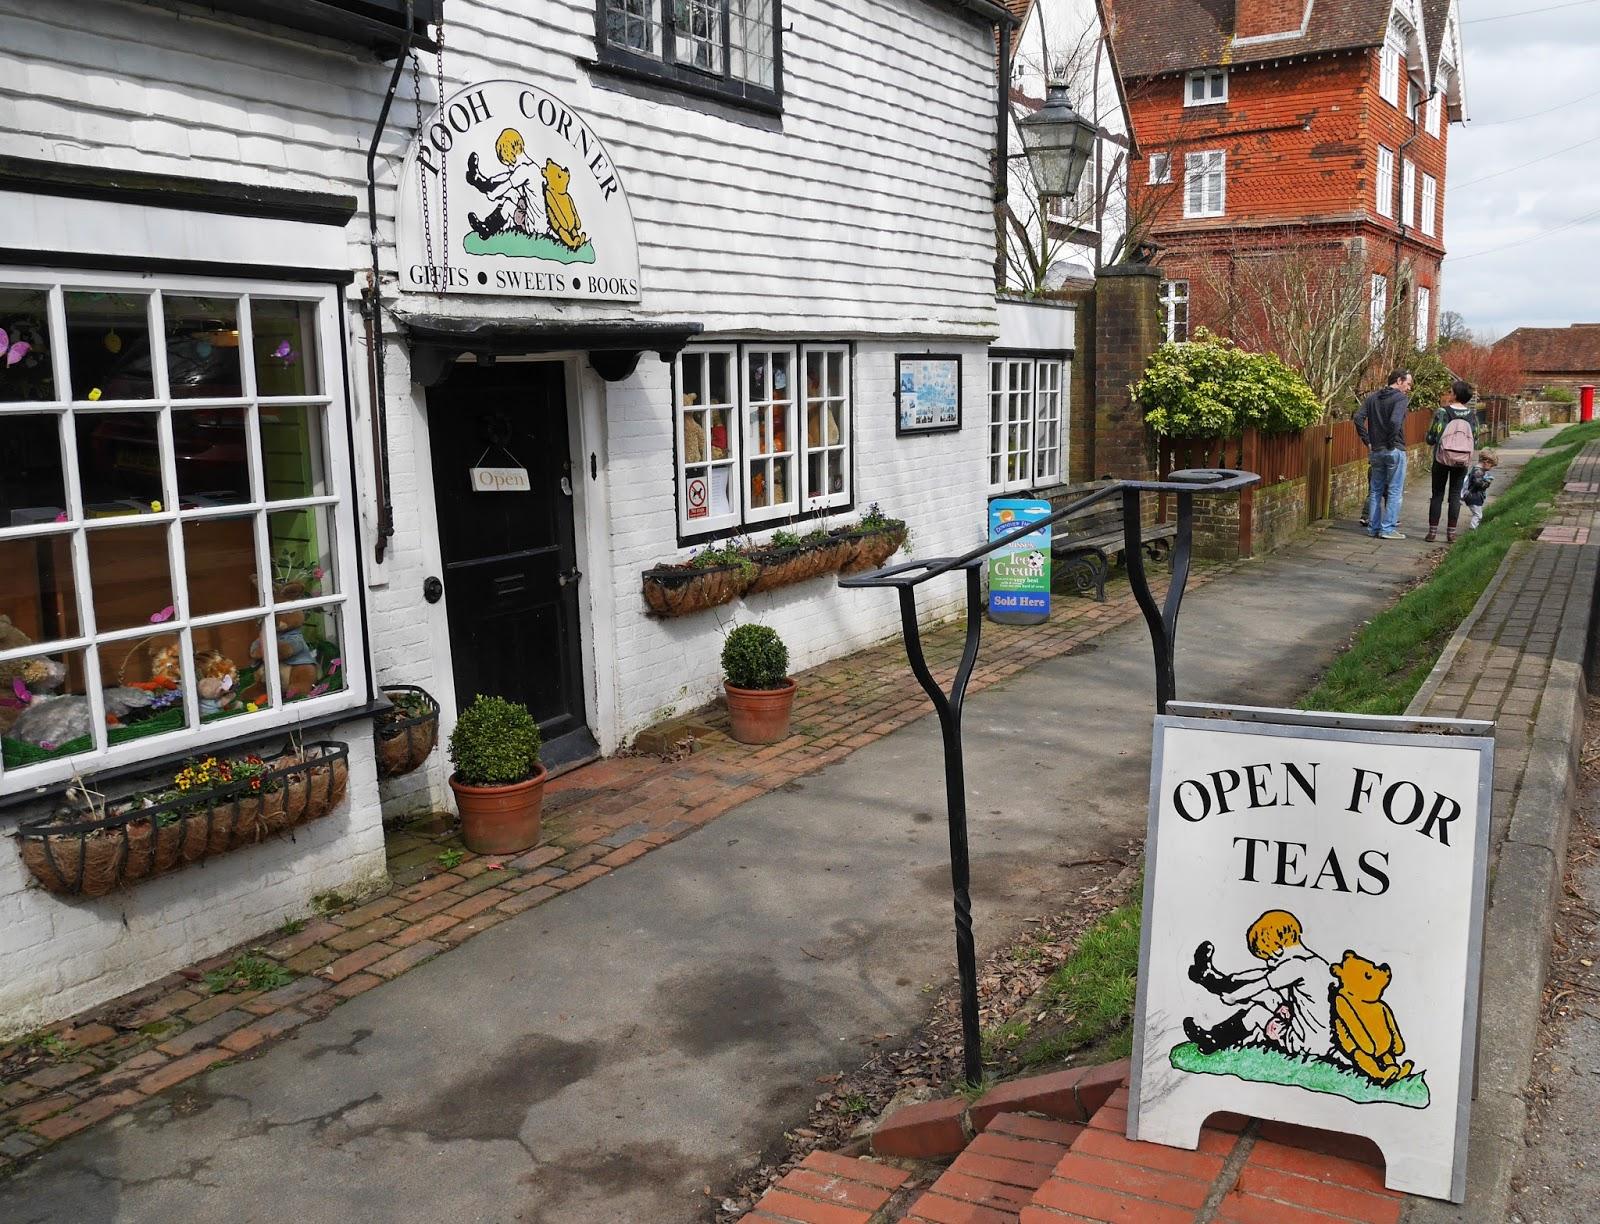 Pooh Corner gift shop in Hartfield, Ashdown Forest